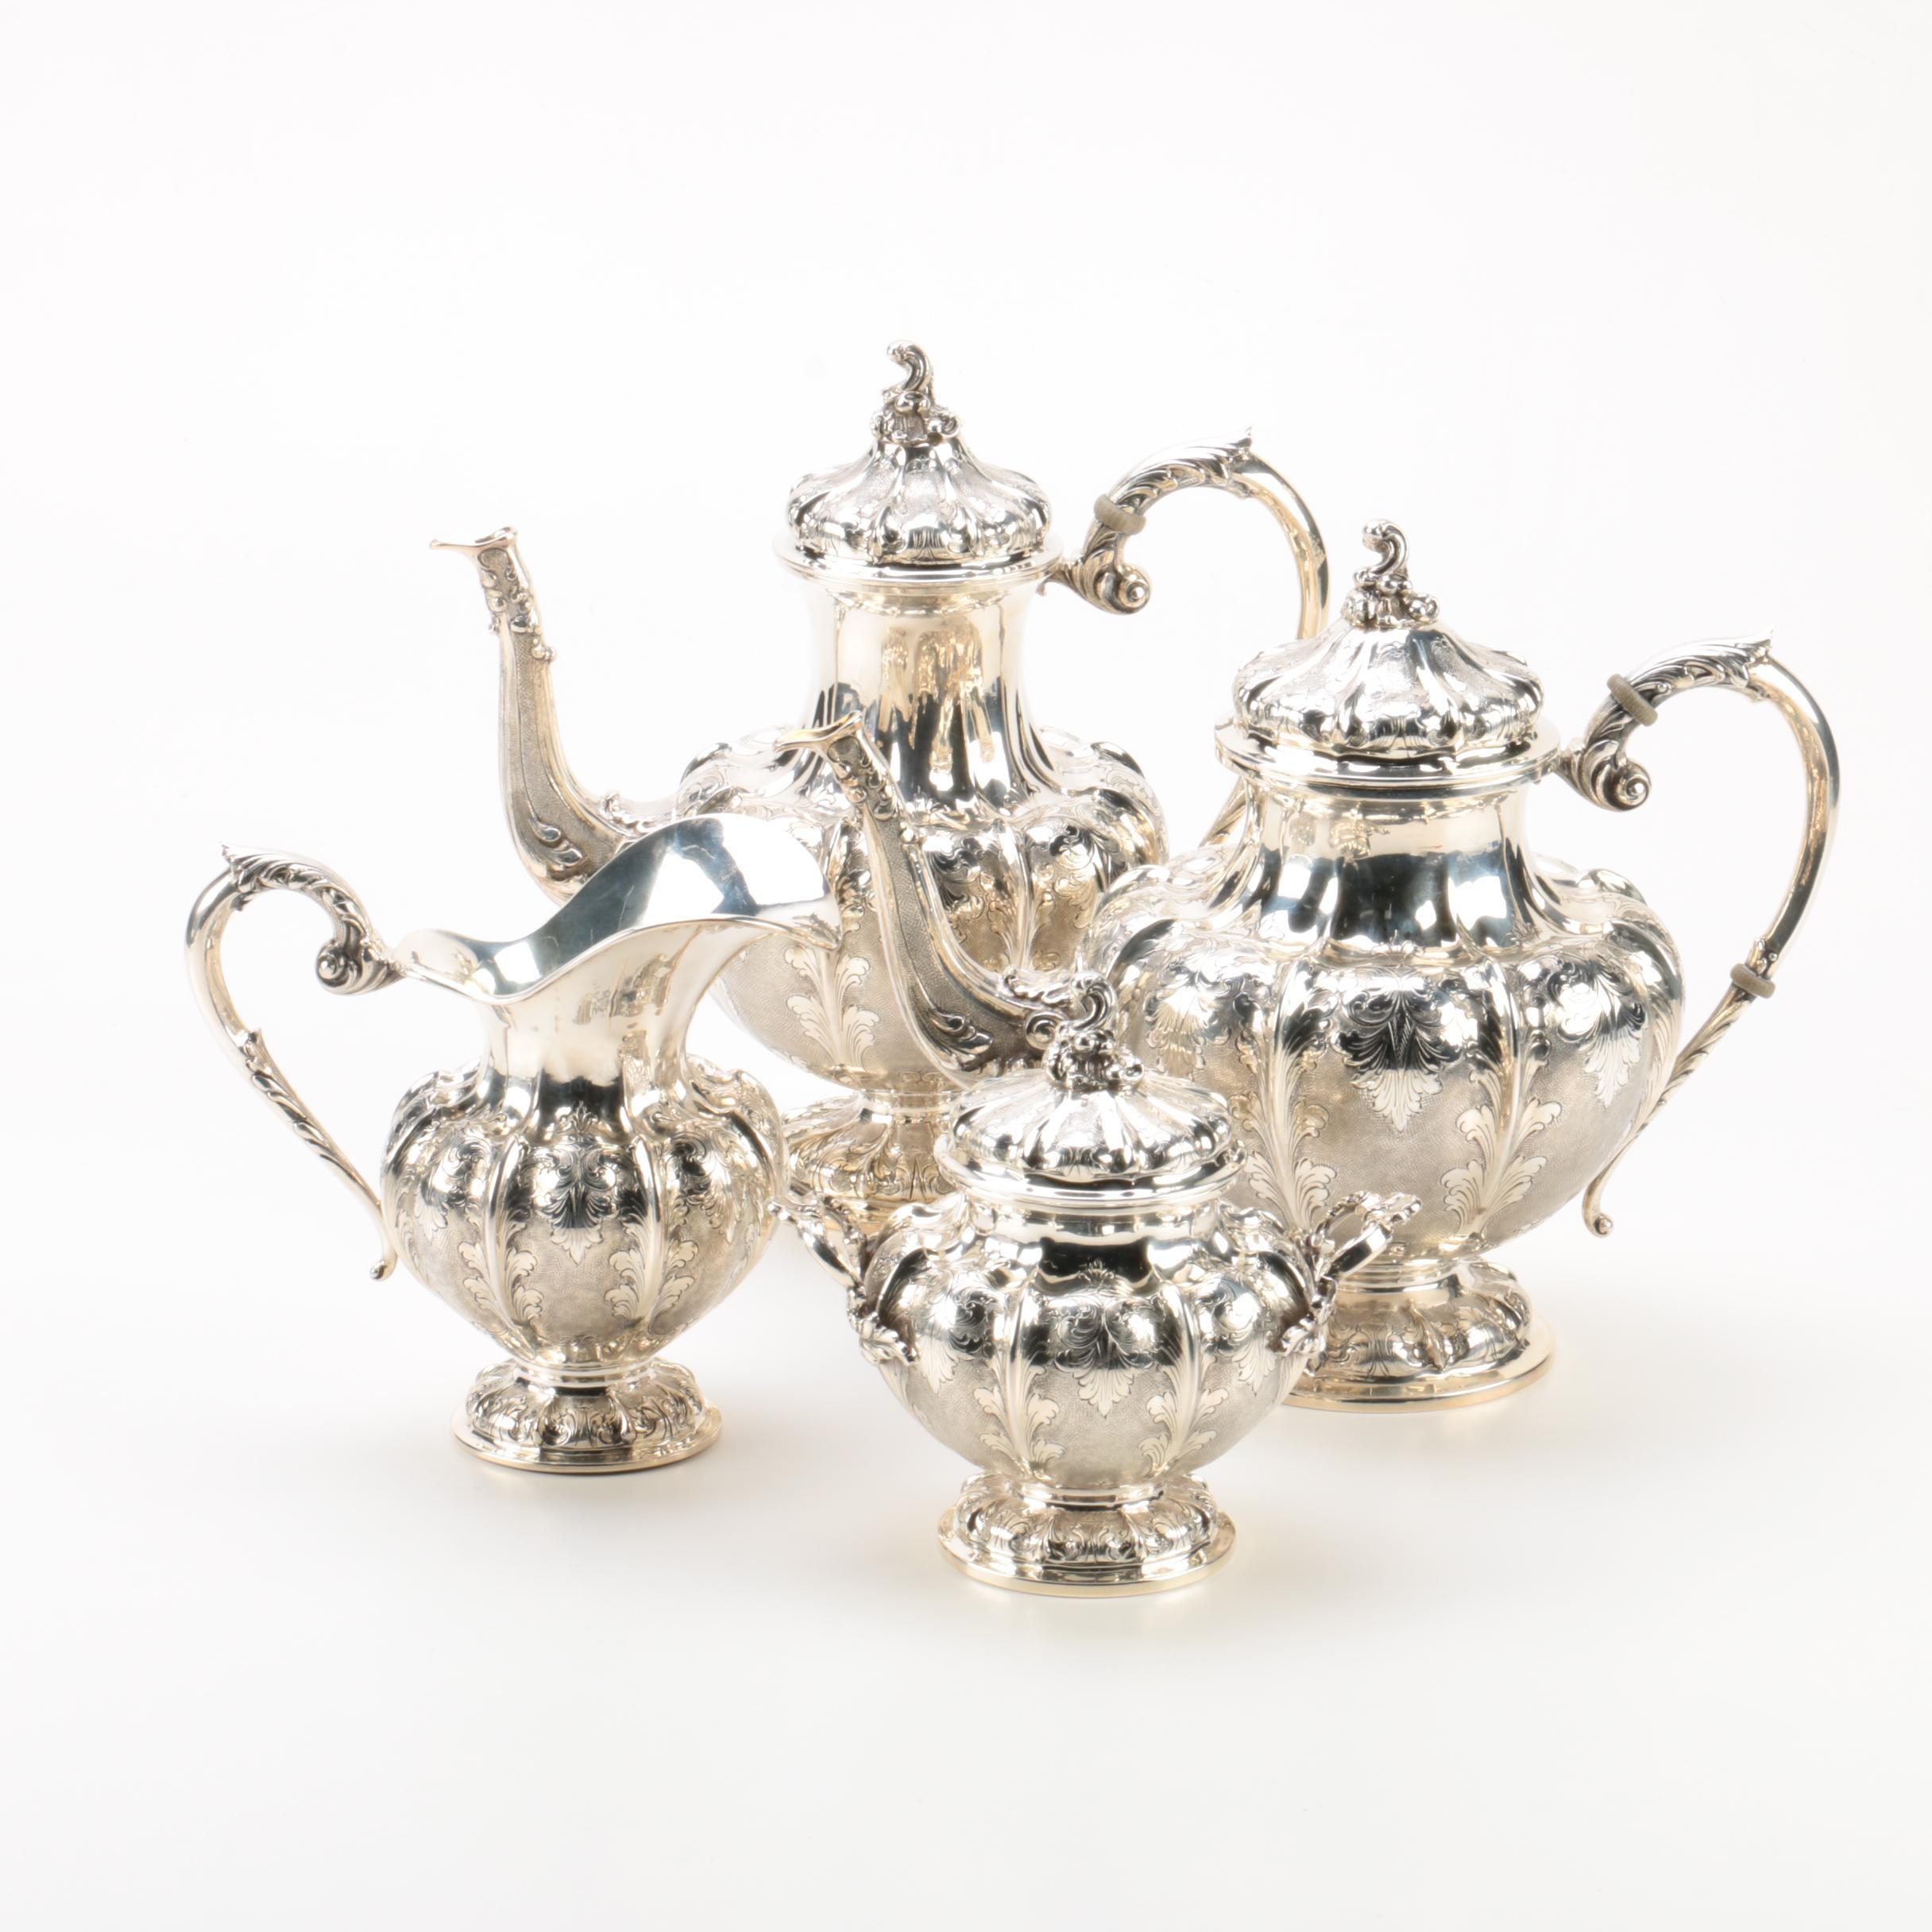 Milanese Arioli Piero 800 Silver Coffee and Tea Set